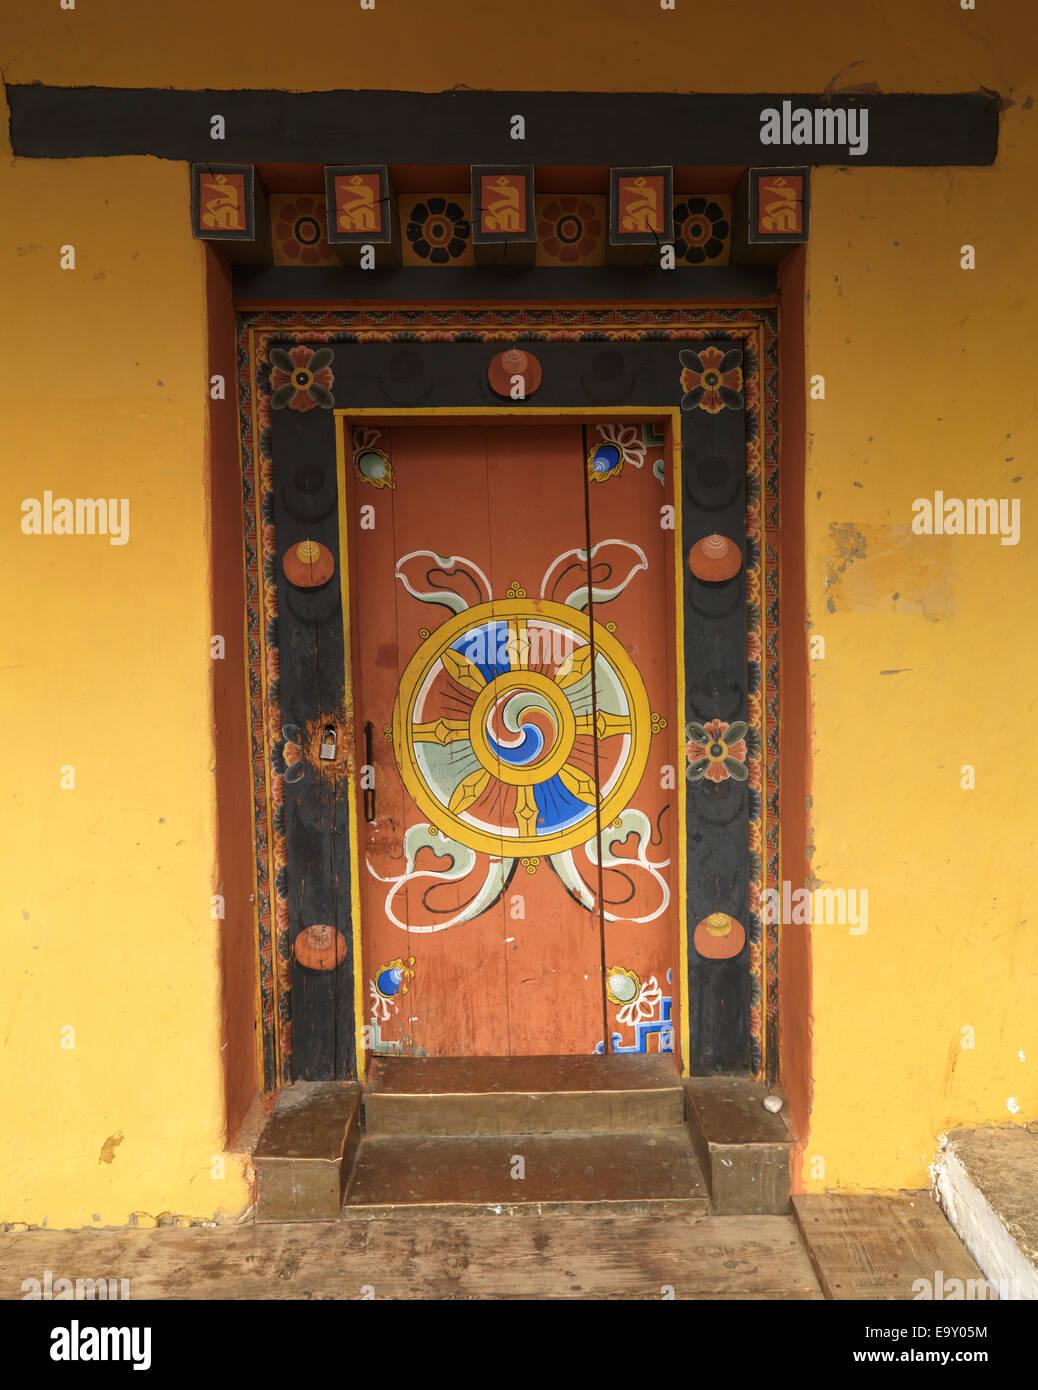 Entrance gate of the Punakha Monastery, Punakha, Bhutan - Stock Image